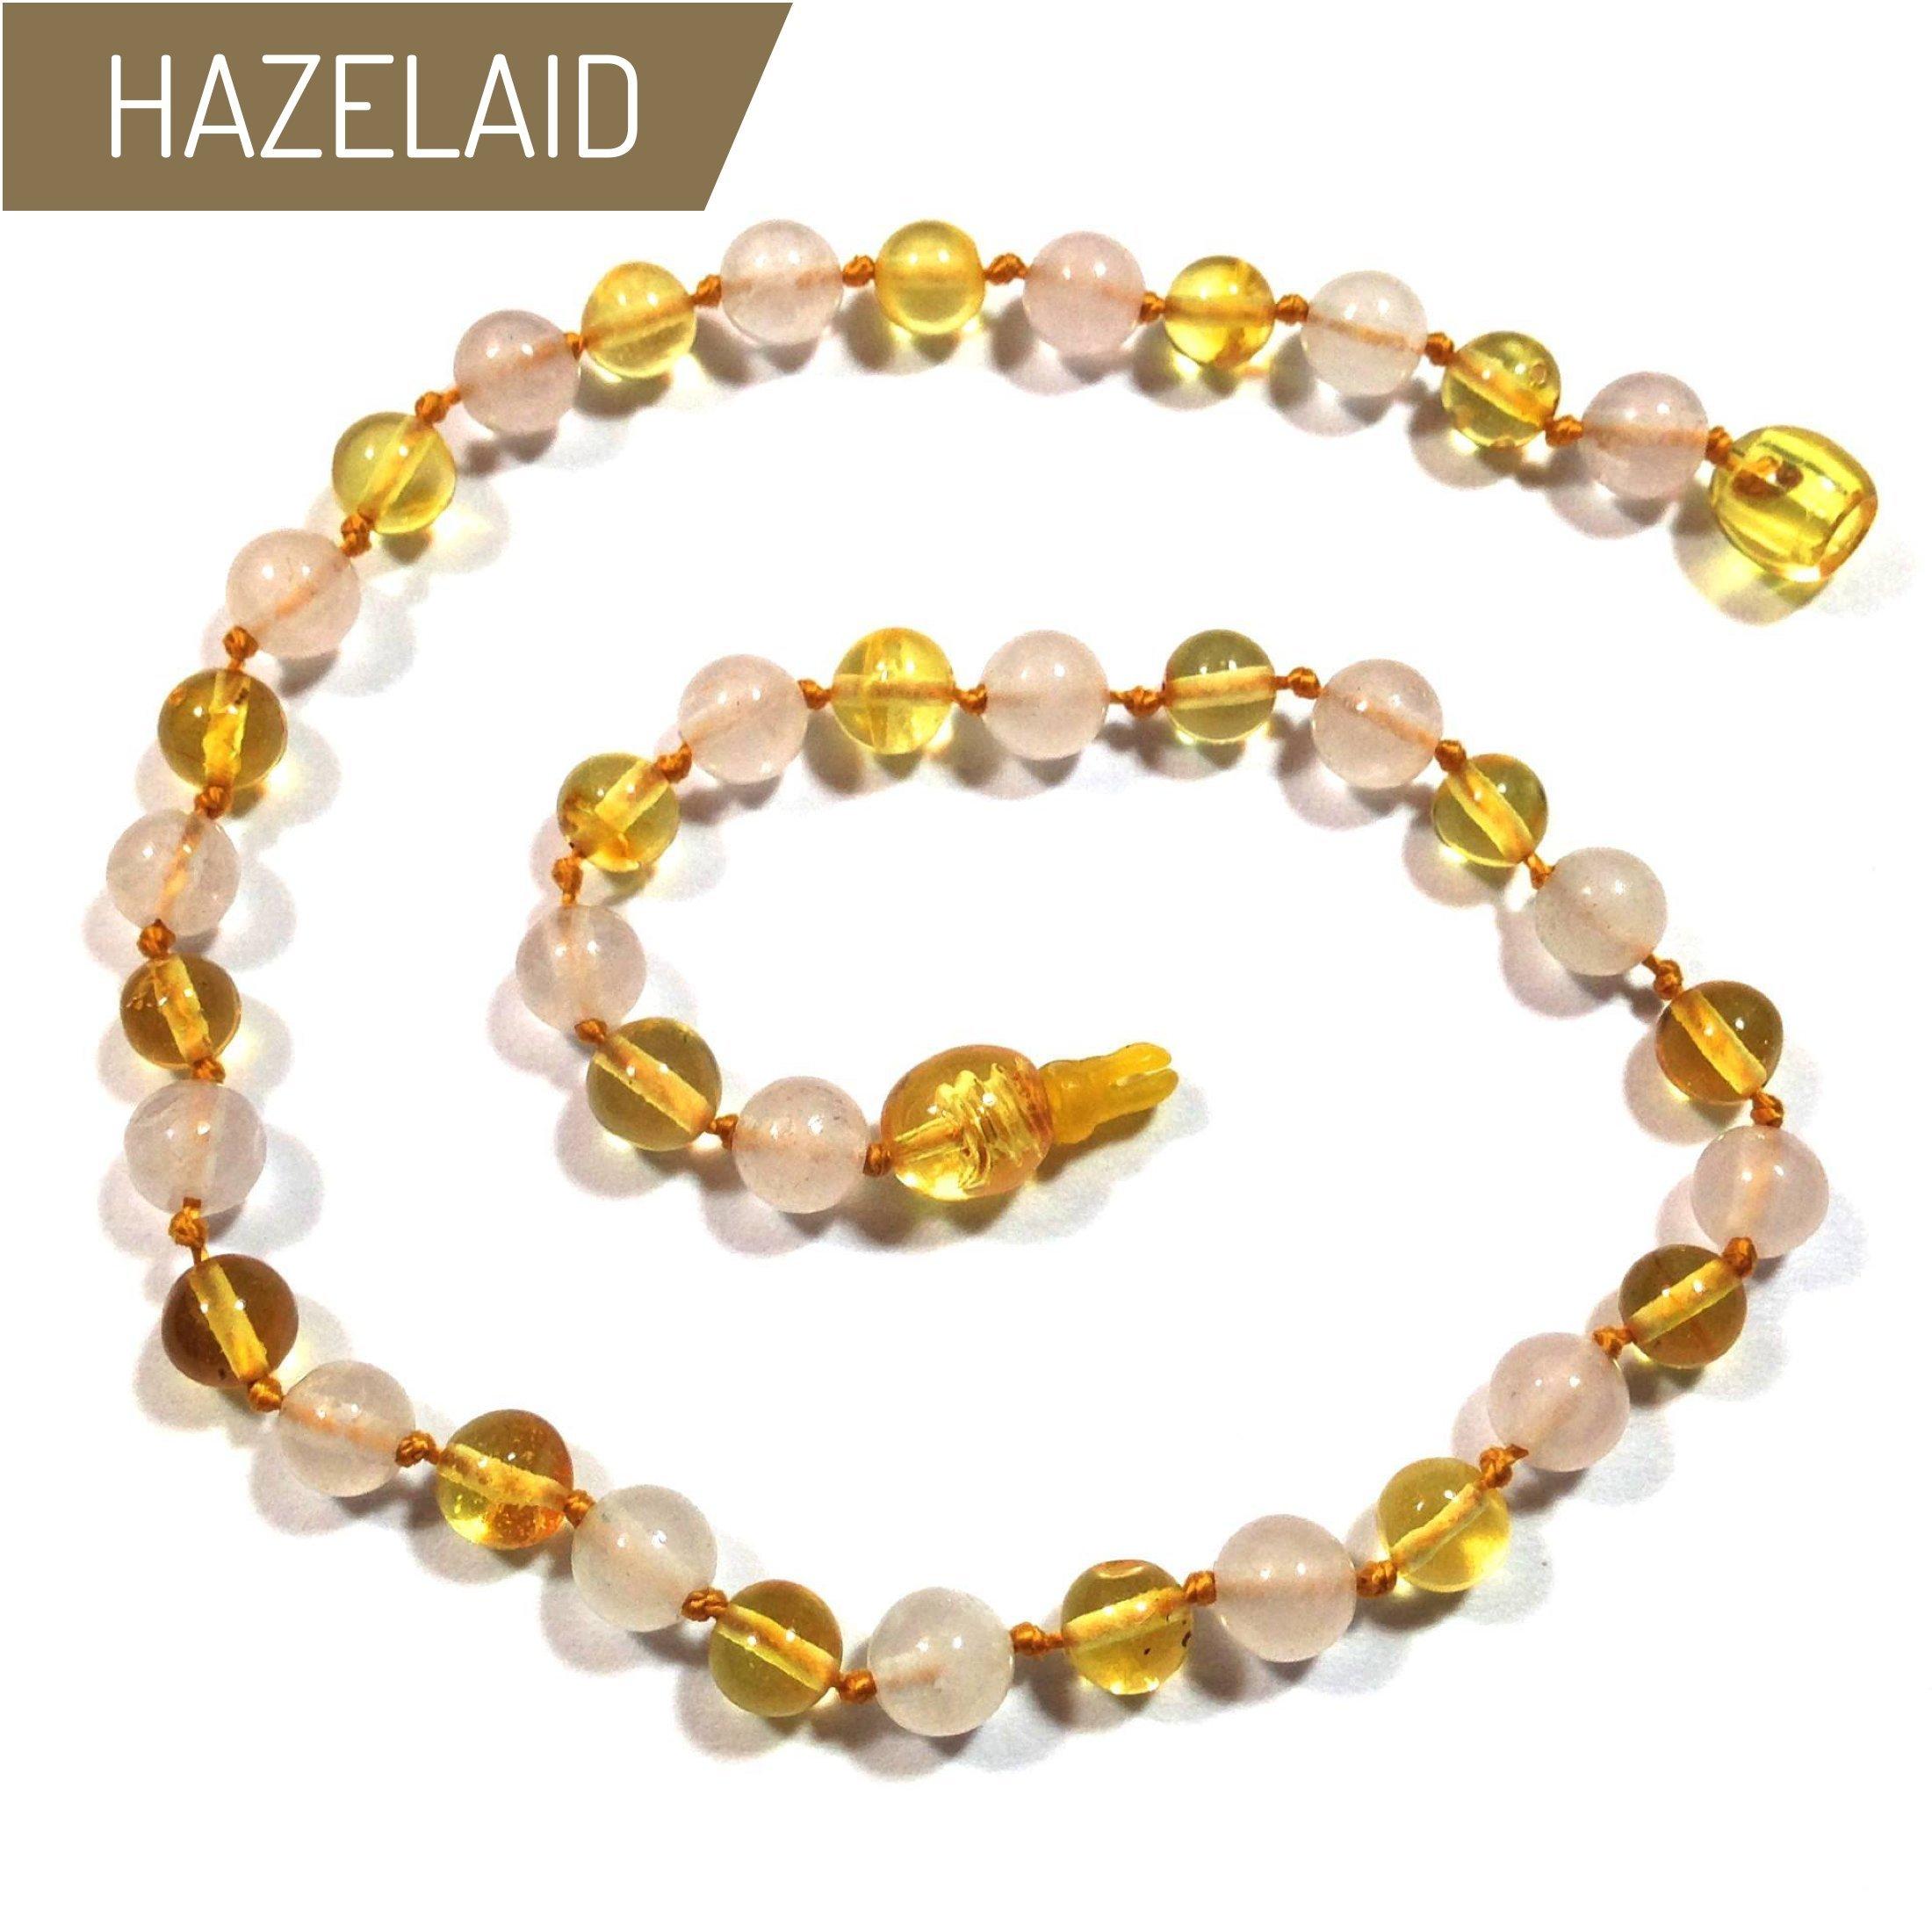 Hazelaid (TM) 14'' Pop-Clasp Baltic Amber & Gemstone: Lemon & Rose Quartz